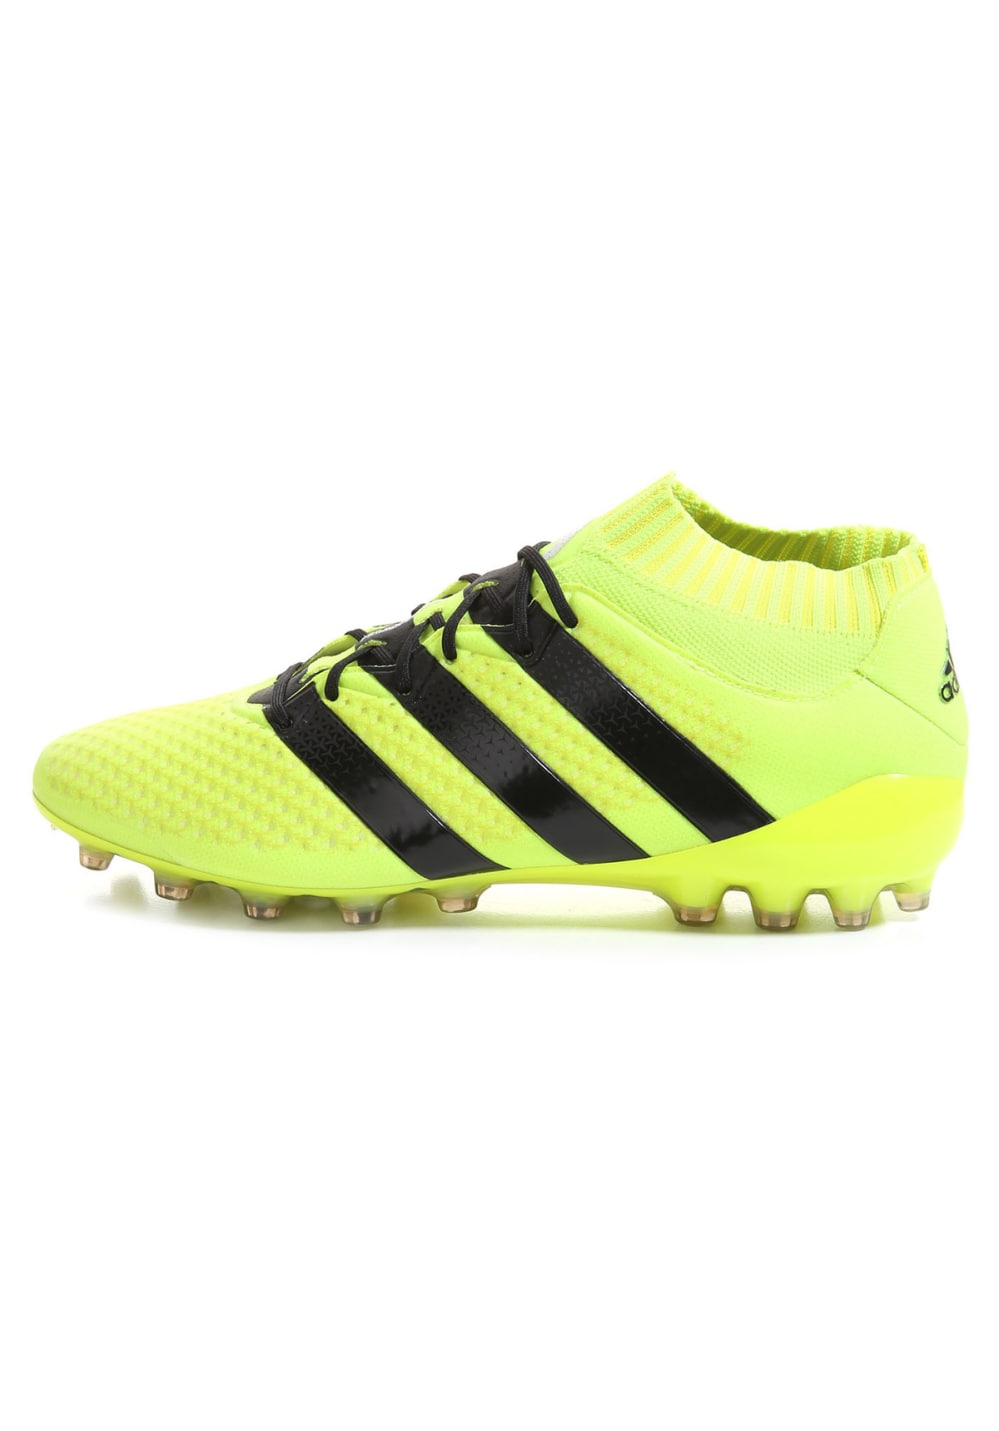 buy popular af2ec 5c90d Next. -60%. adidas. ACE 16.1 Primeknit AG - Botas de futbol para Hombre.  Precio Habitual  ...